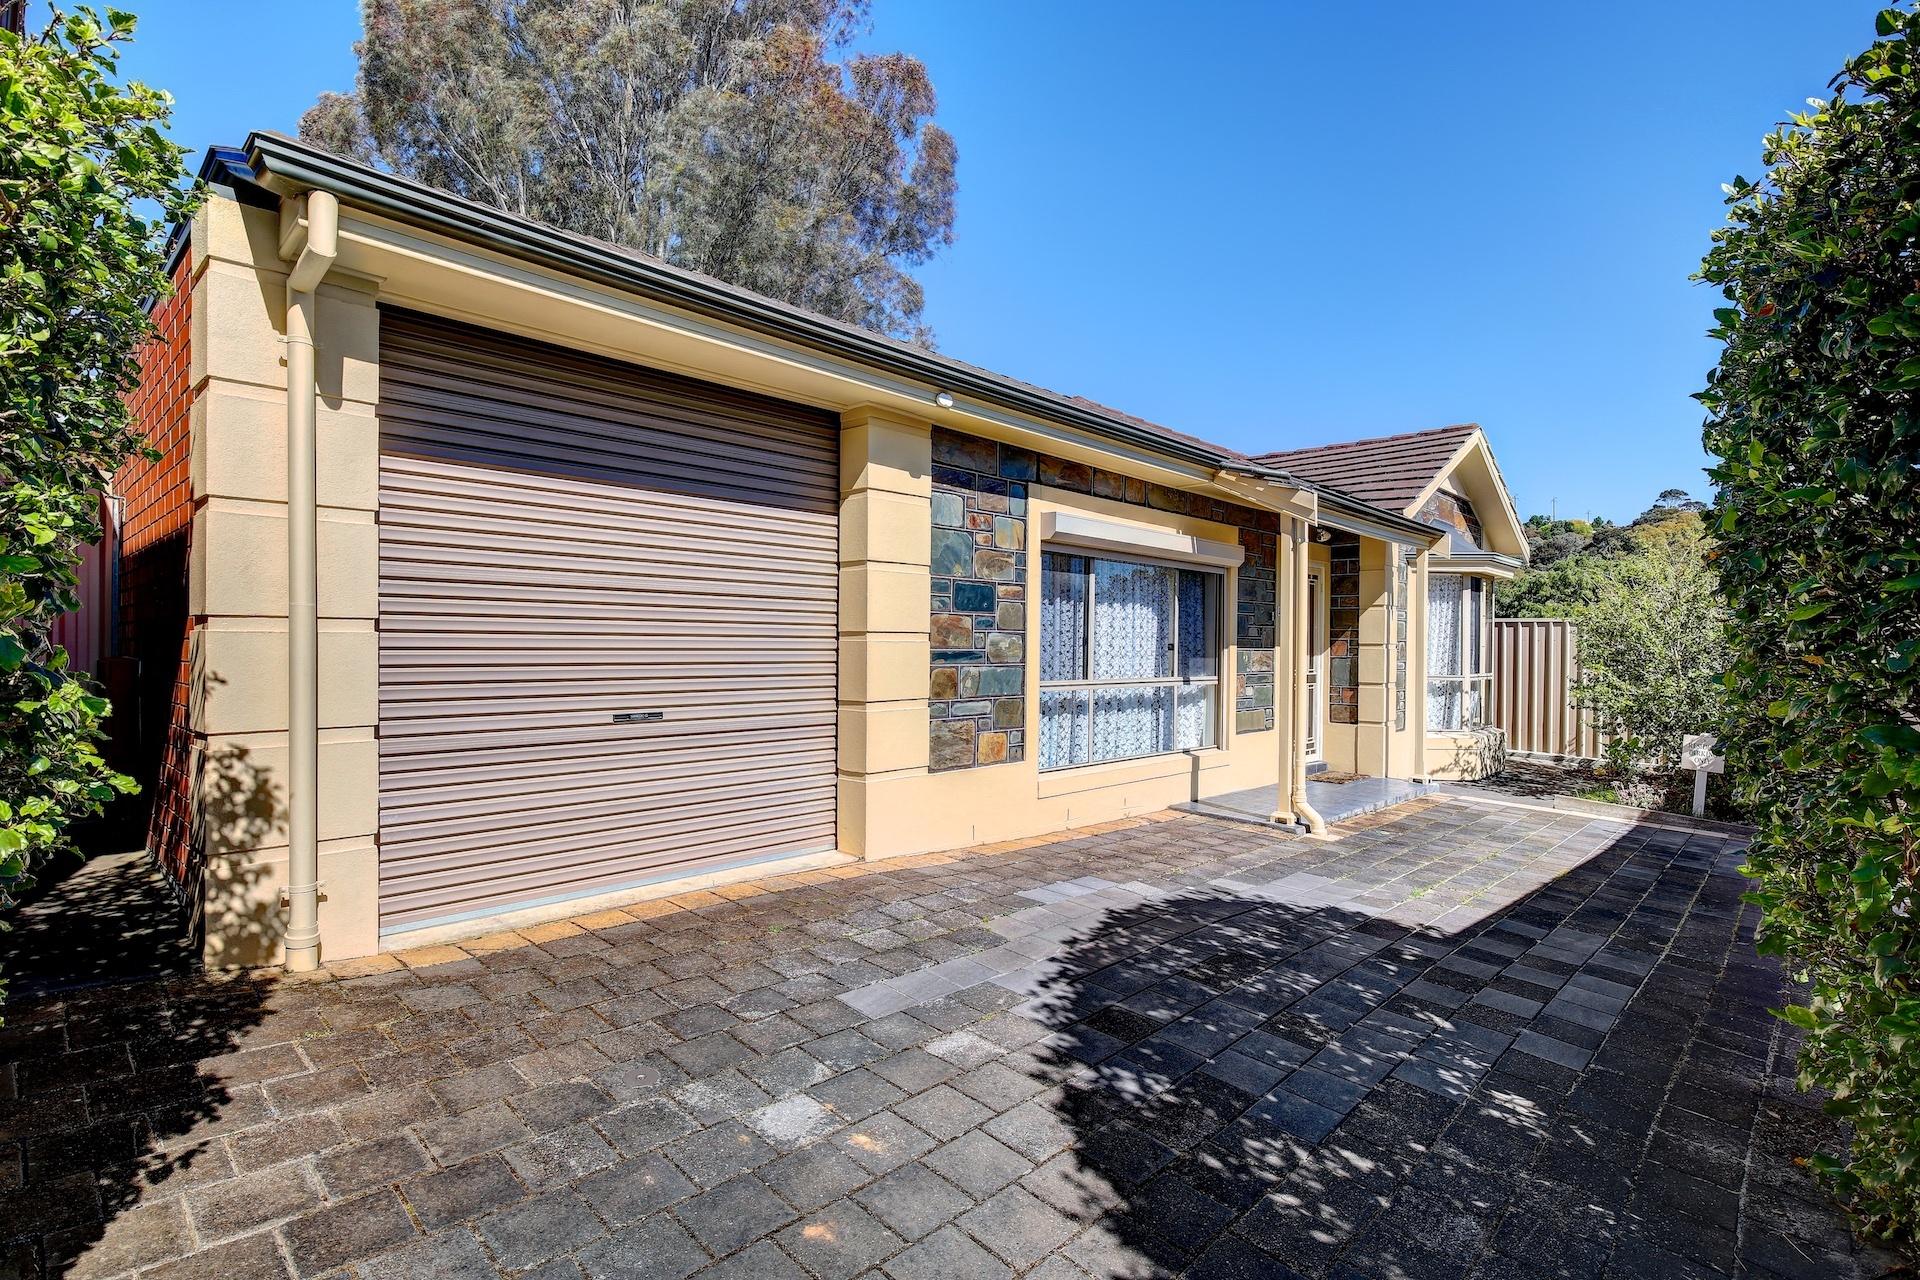 Bluestone Fronted Courtyard Villa - 3 Bedroom